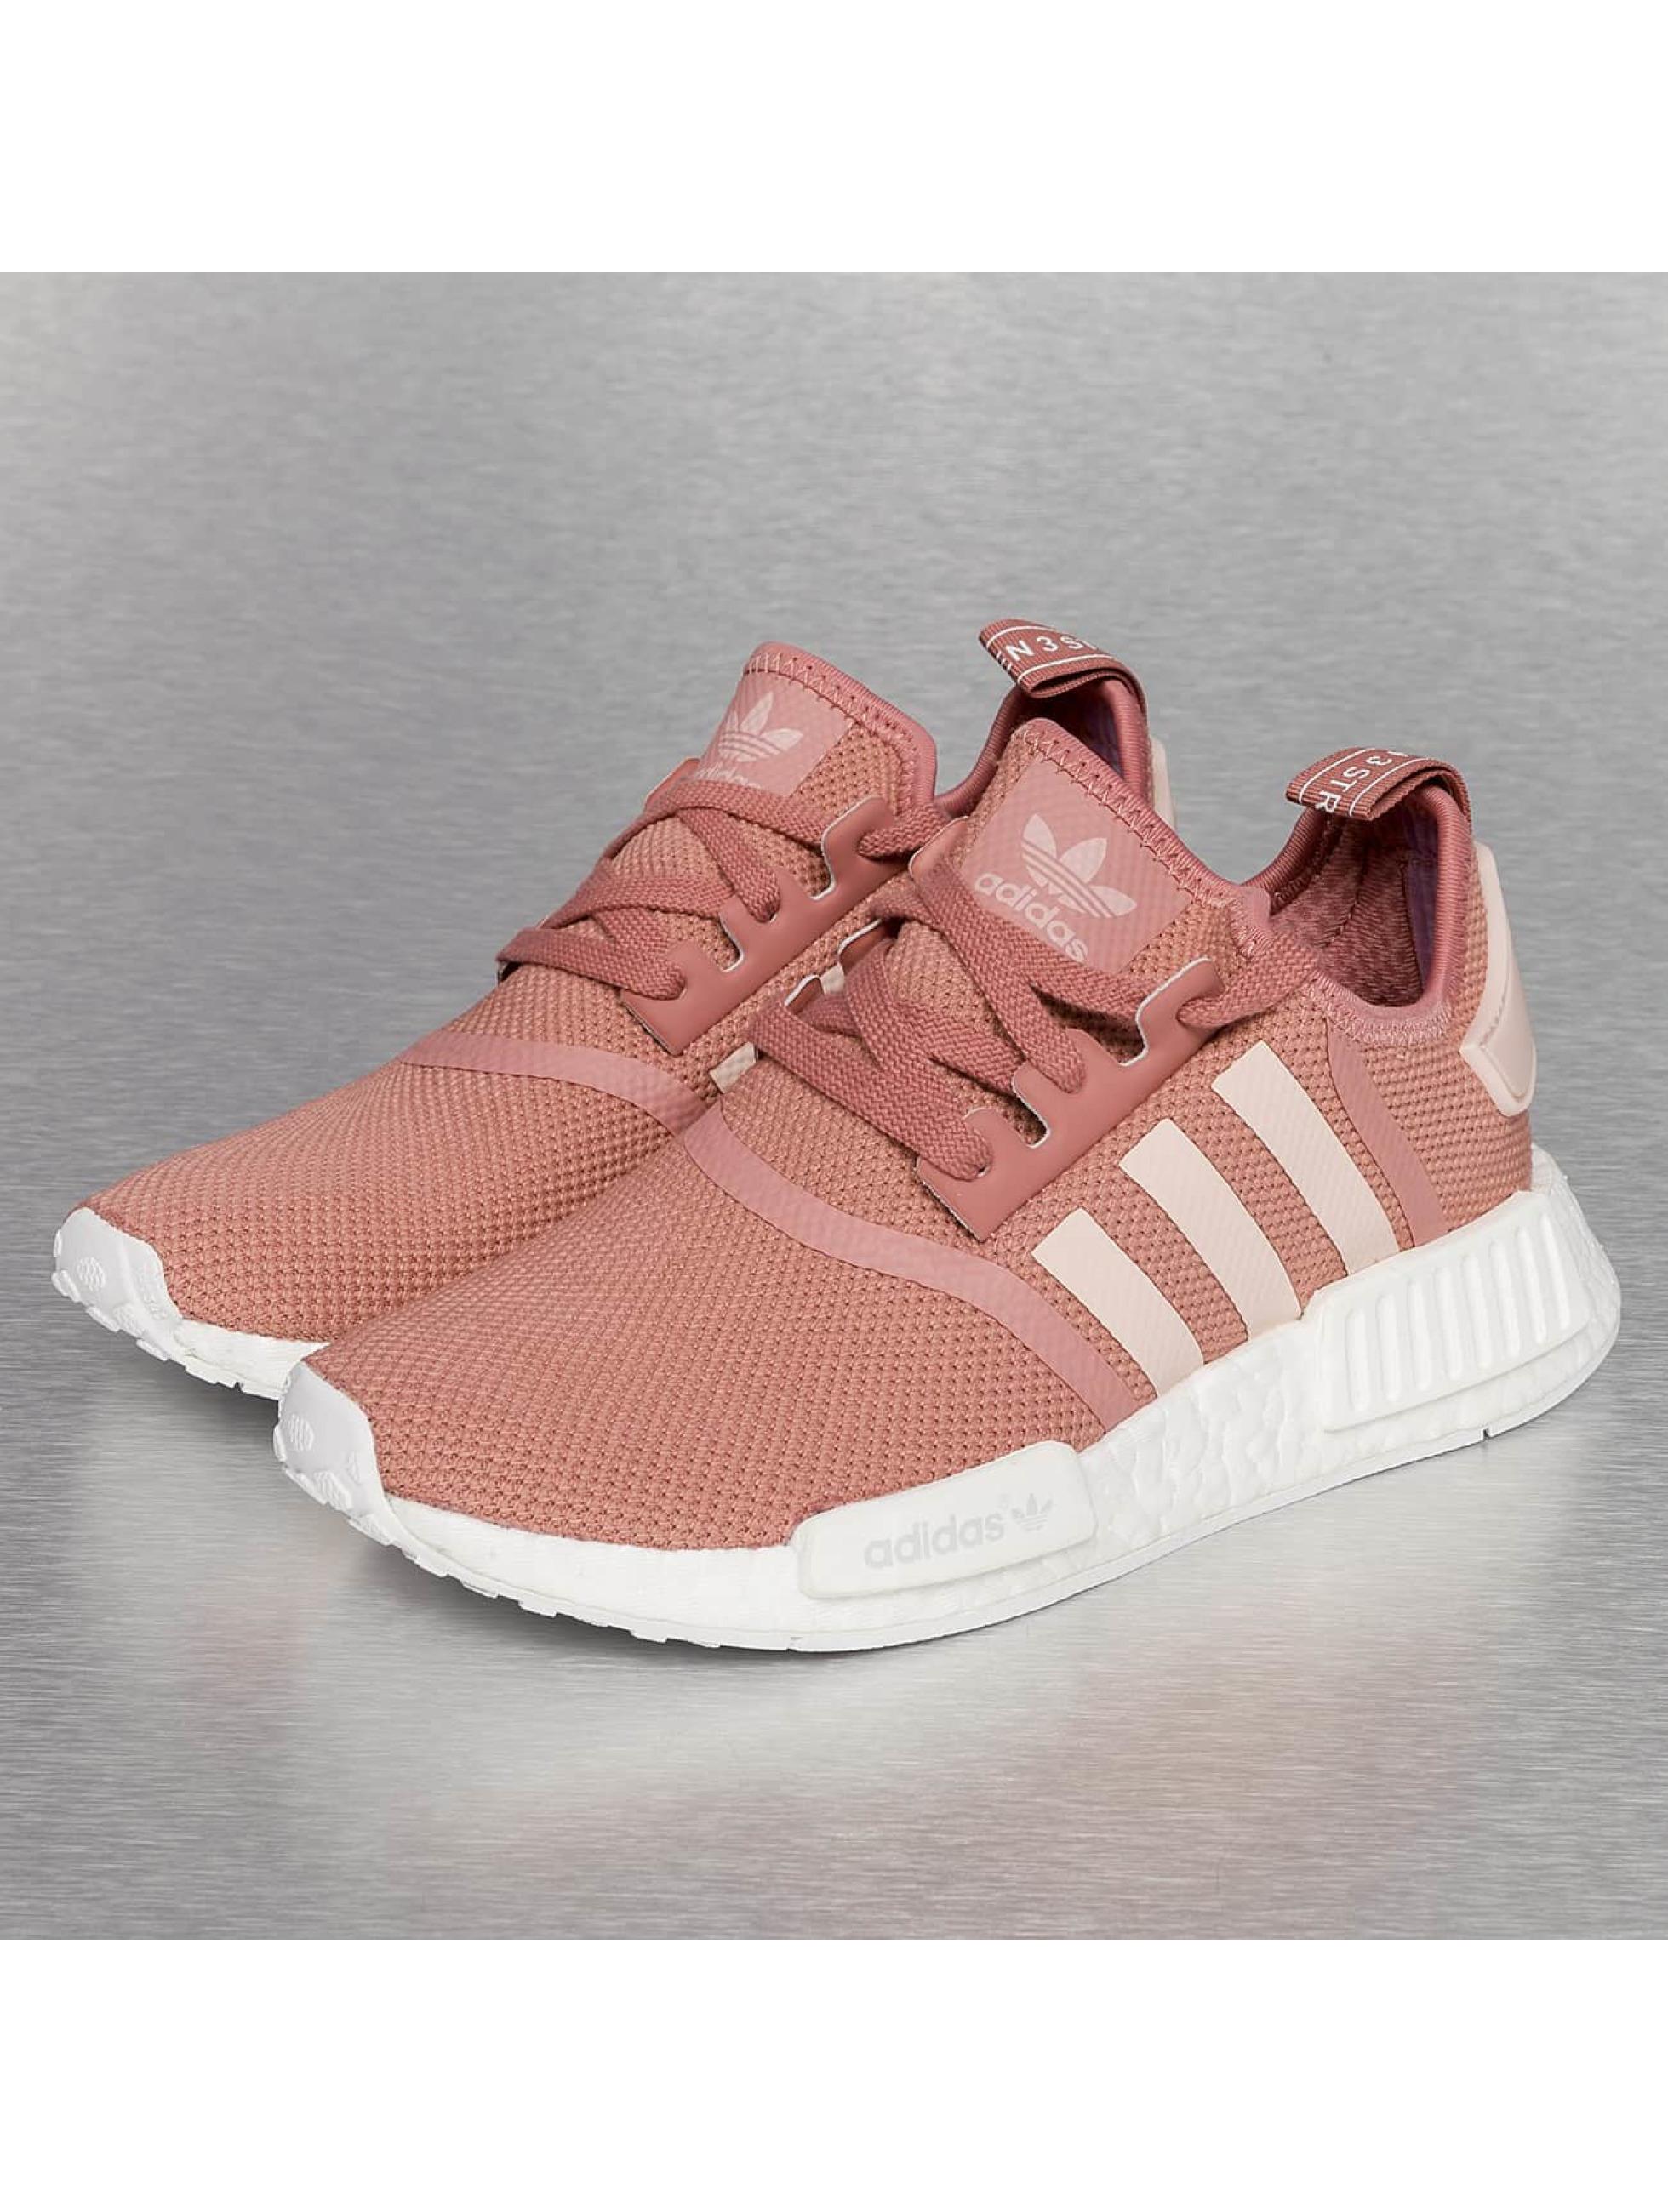 Nmd R1 Adidas Dames